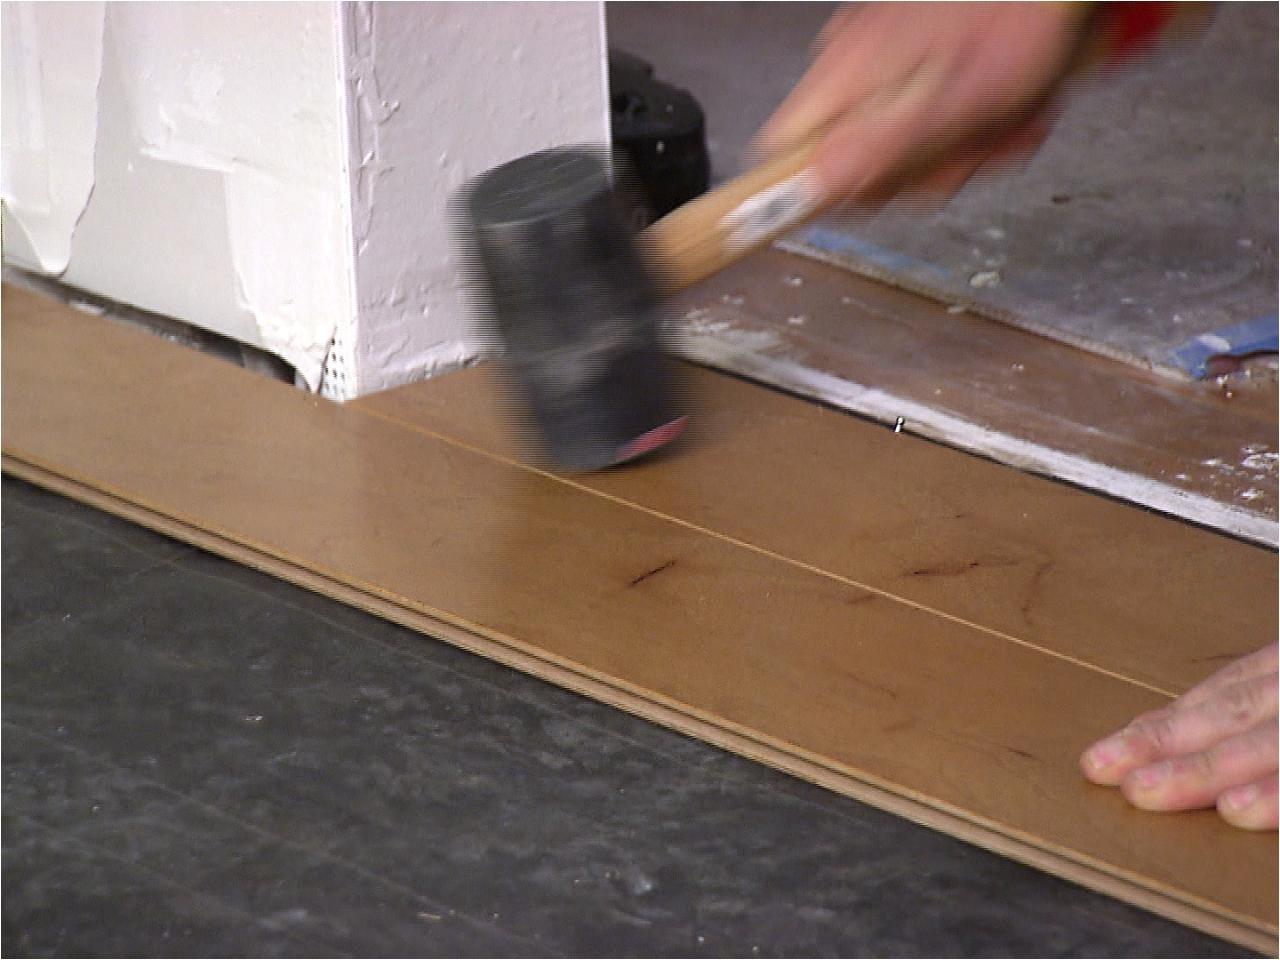 dkim112 engineered hardwood floor install s4x3